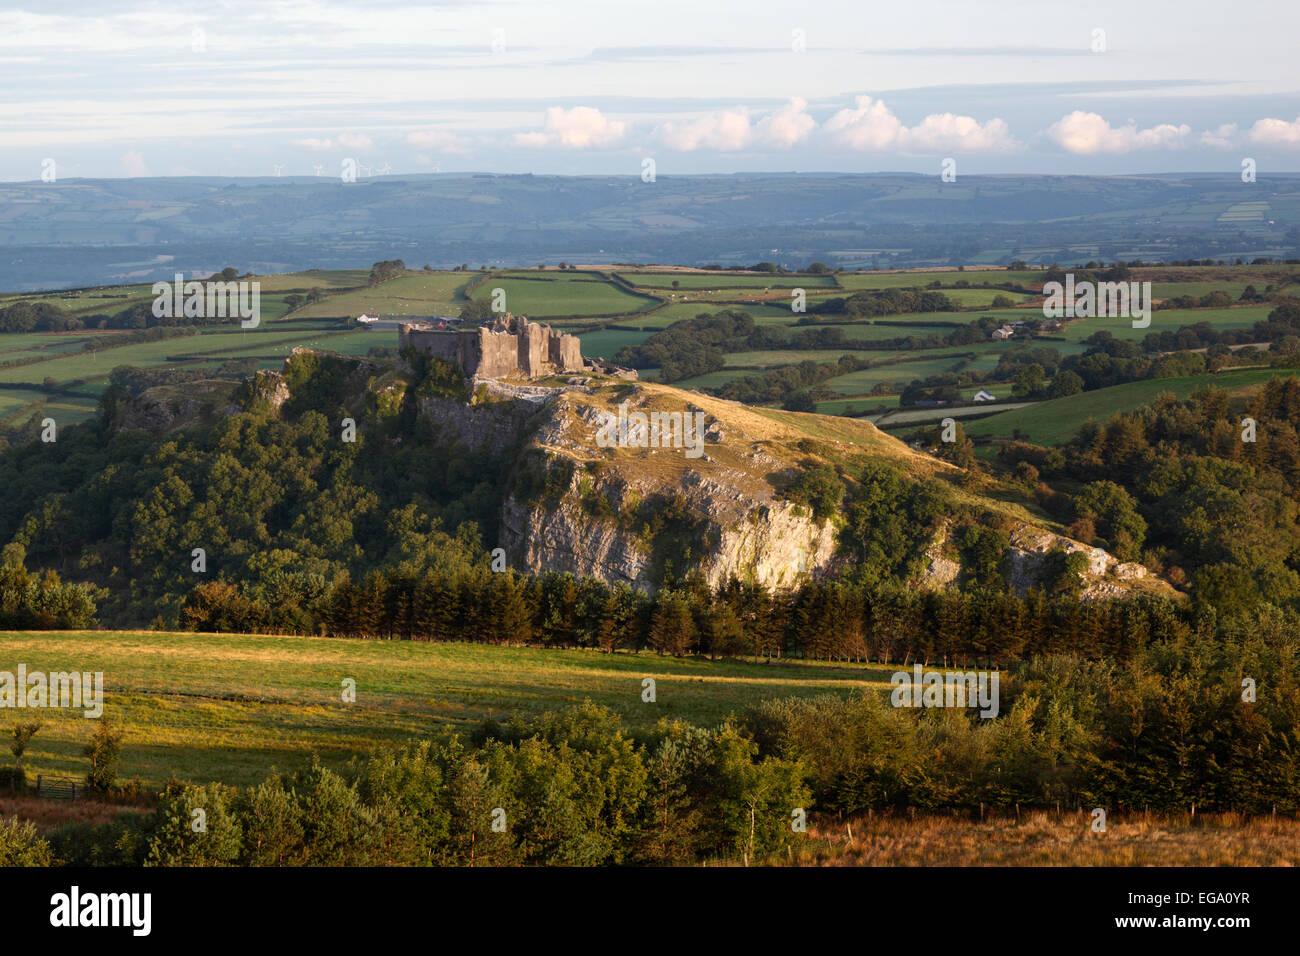 Carreg Cennen Castle, near Llandeilo, Brecon Beacons National Park, Carmarthenshire, Wales, United Kingdom, Europe - Stock Image